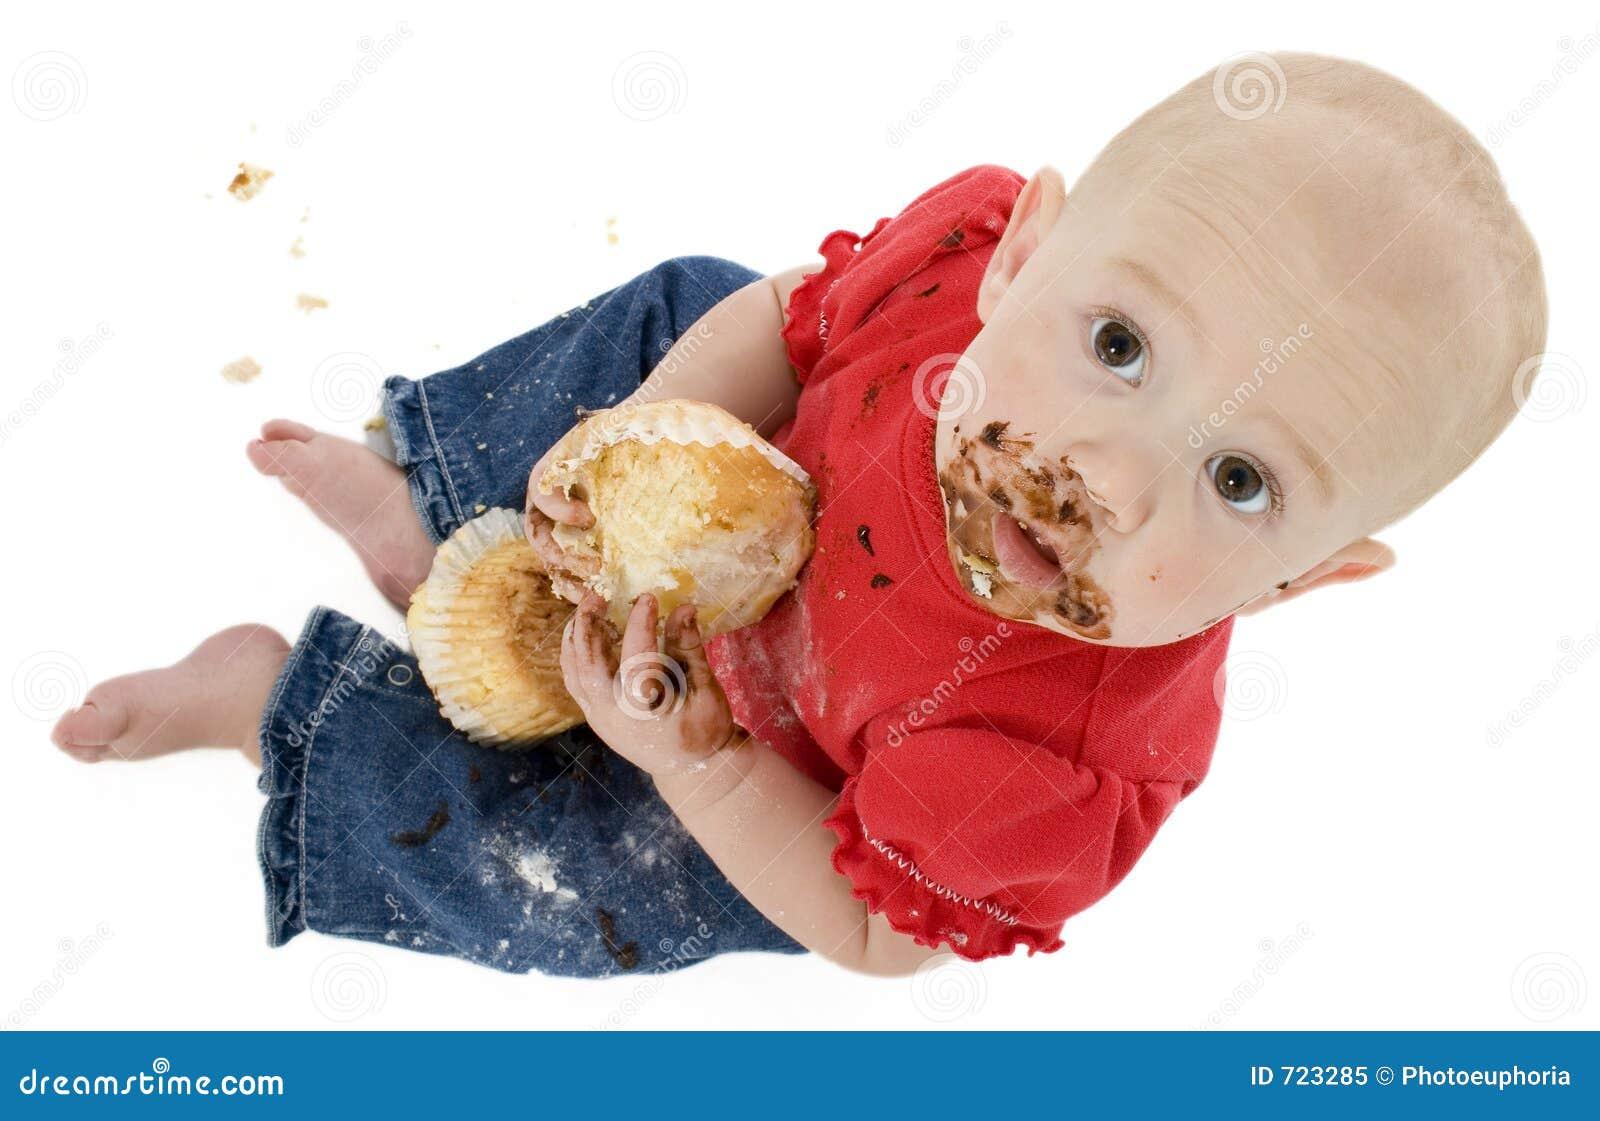 Baby Eating Cake Clipart : Baby Eating Cake Royalty Free Stock Photo - Image: 723285